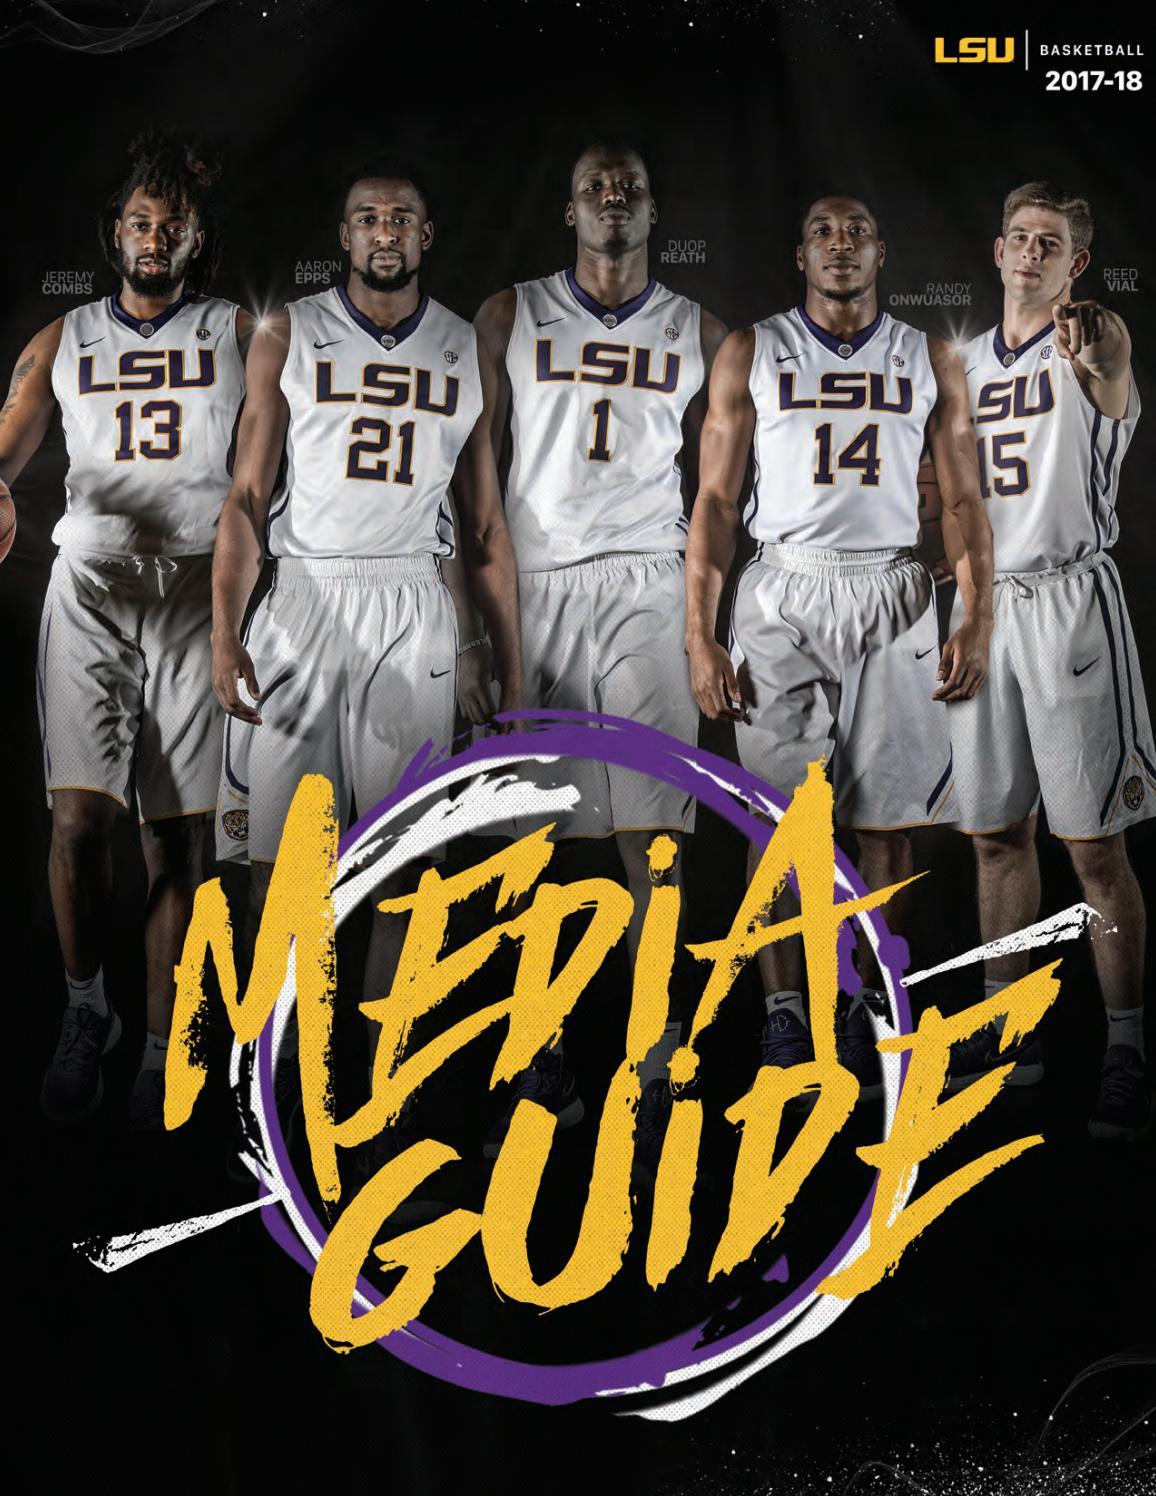 2017-18 LSU Men's Basketball Media Guide by LSU Athletics - issuu